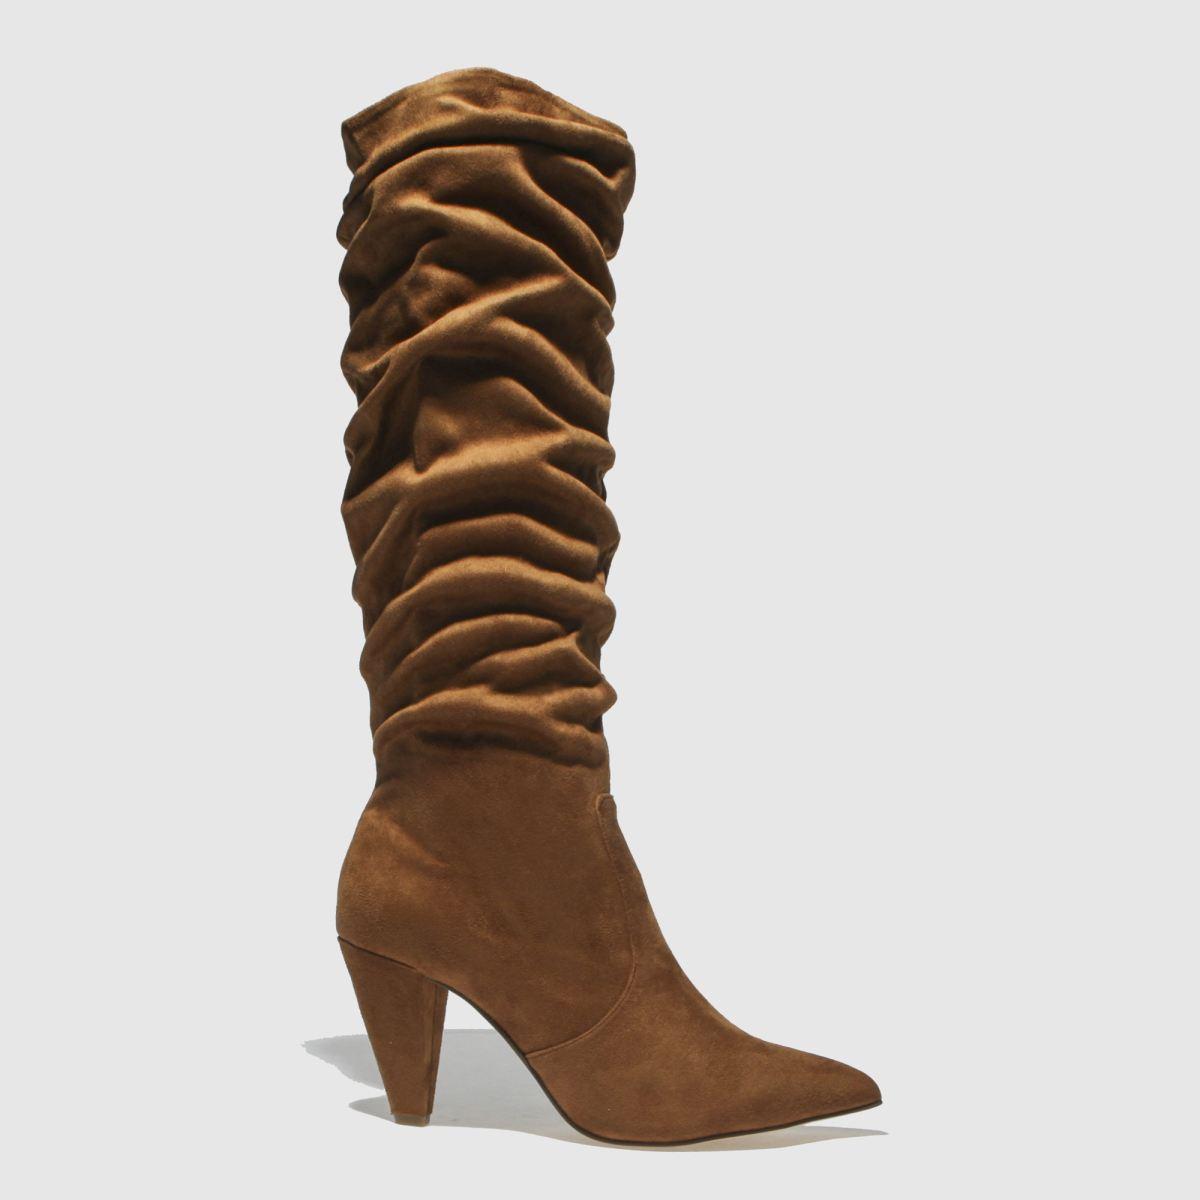 Schuh Tan Sister Boots